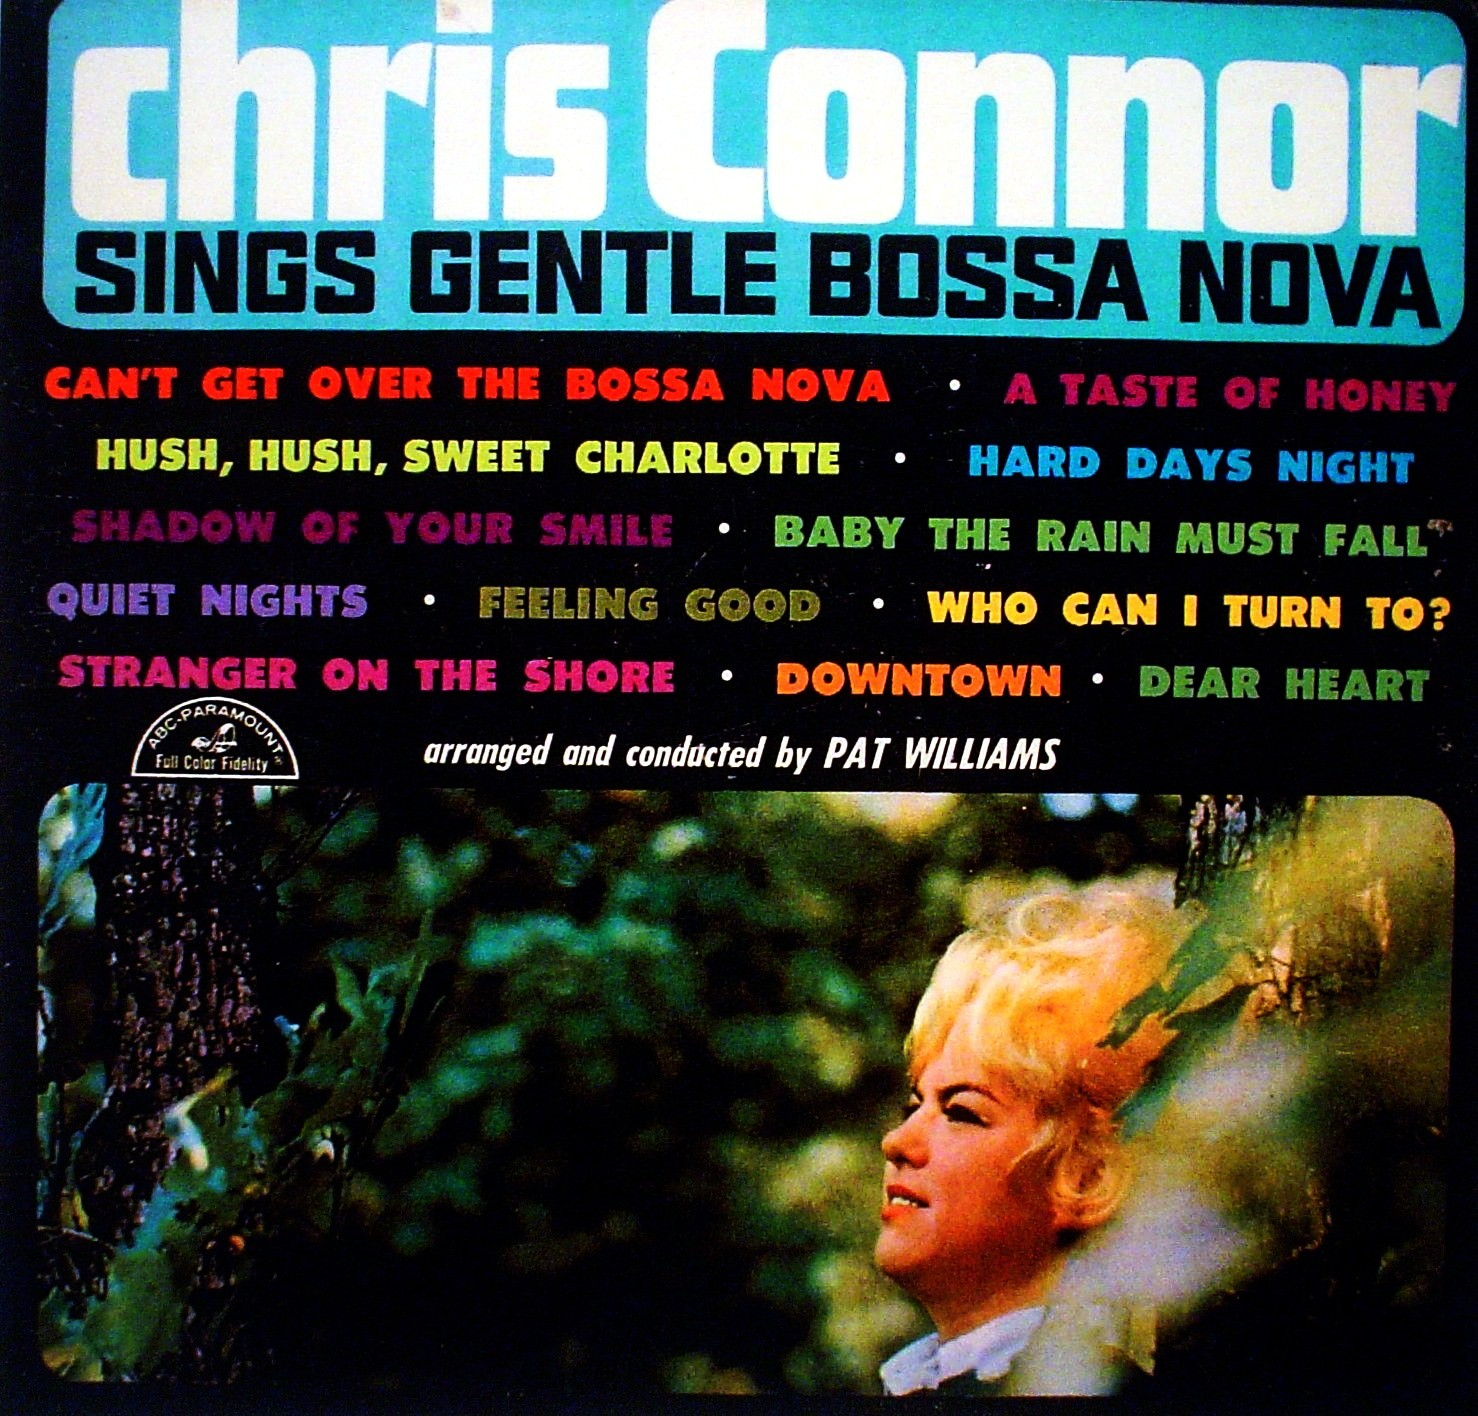 Chris Connor Sings Gentle Bossa Nova Nix This Innovative Os For